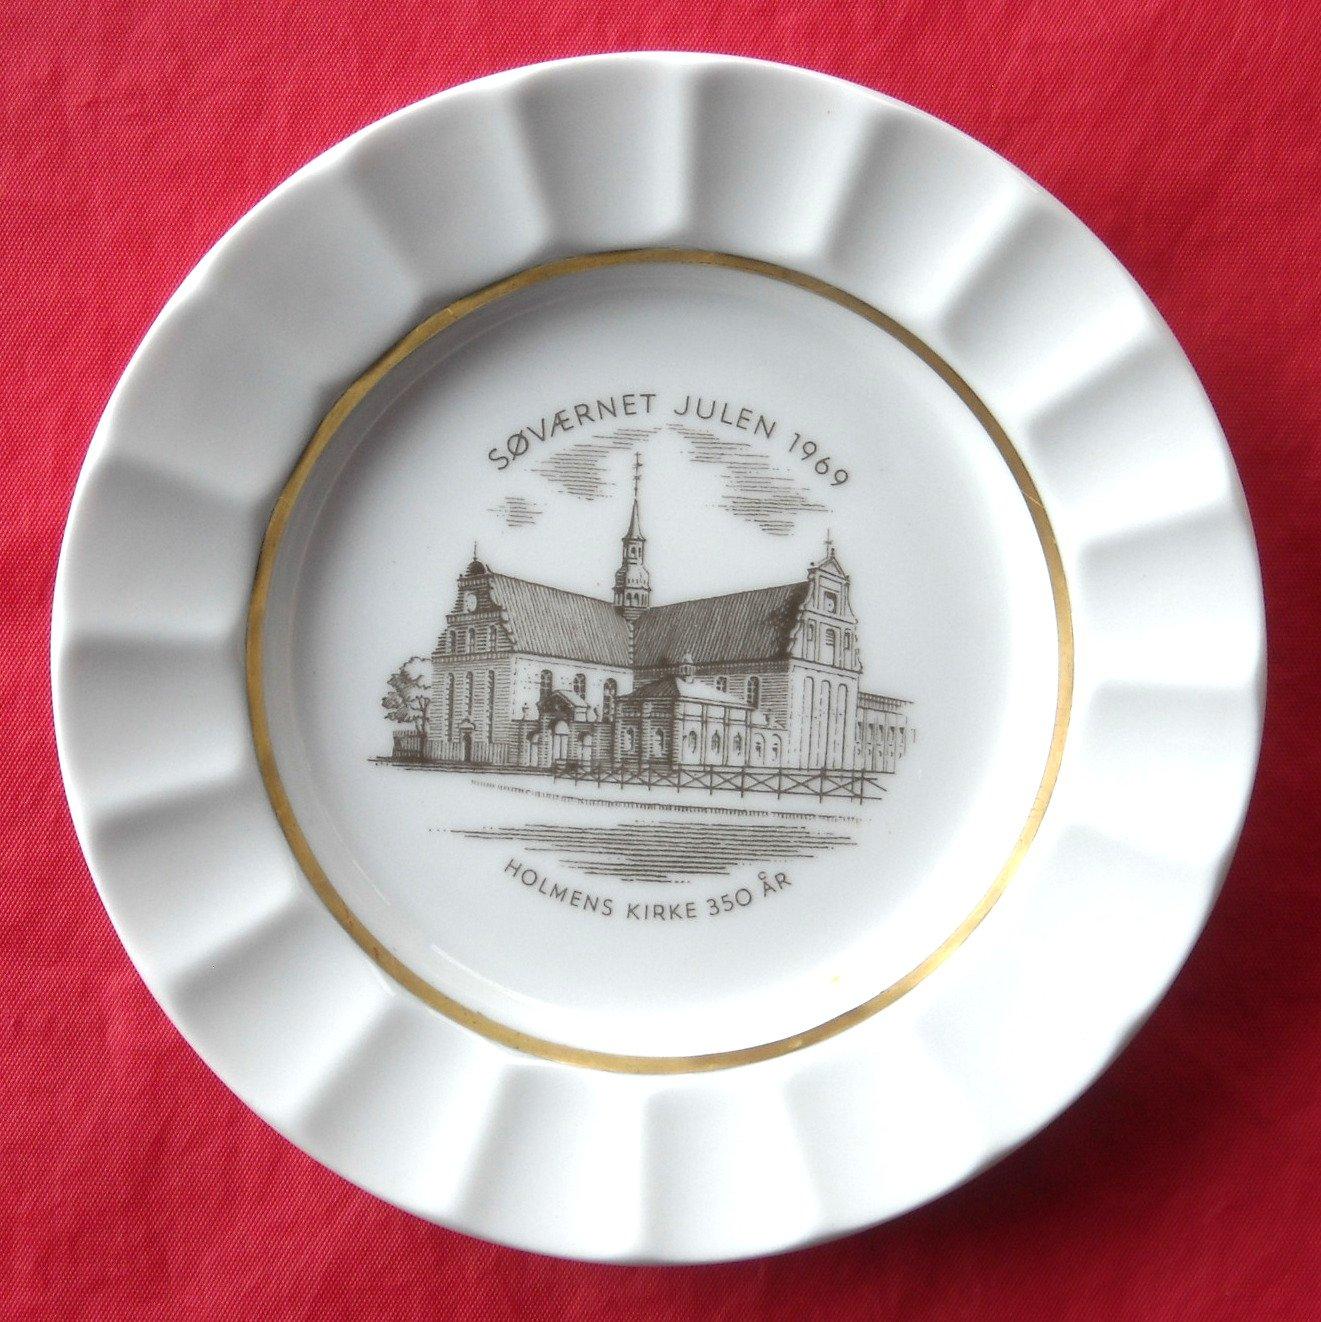 Royal Copenhagen Navy Julen 1969 Christmas Plate Dish